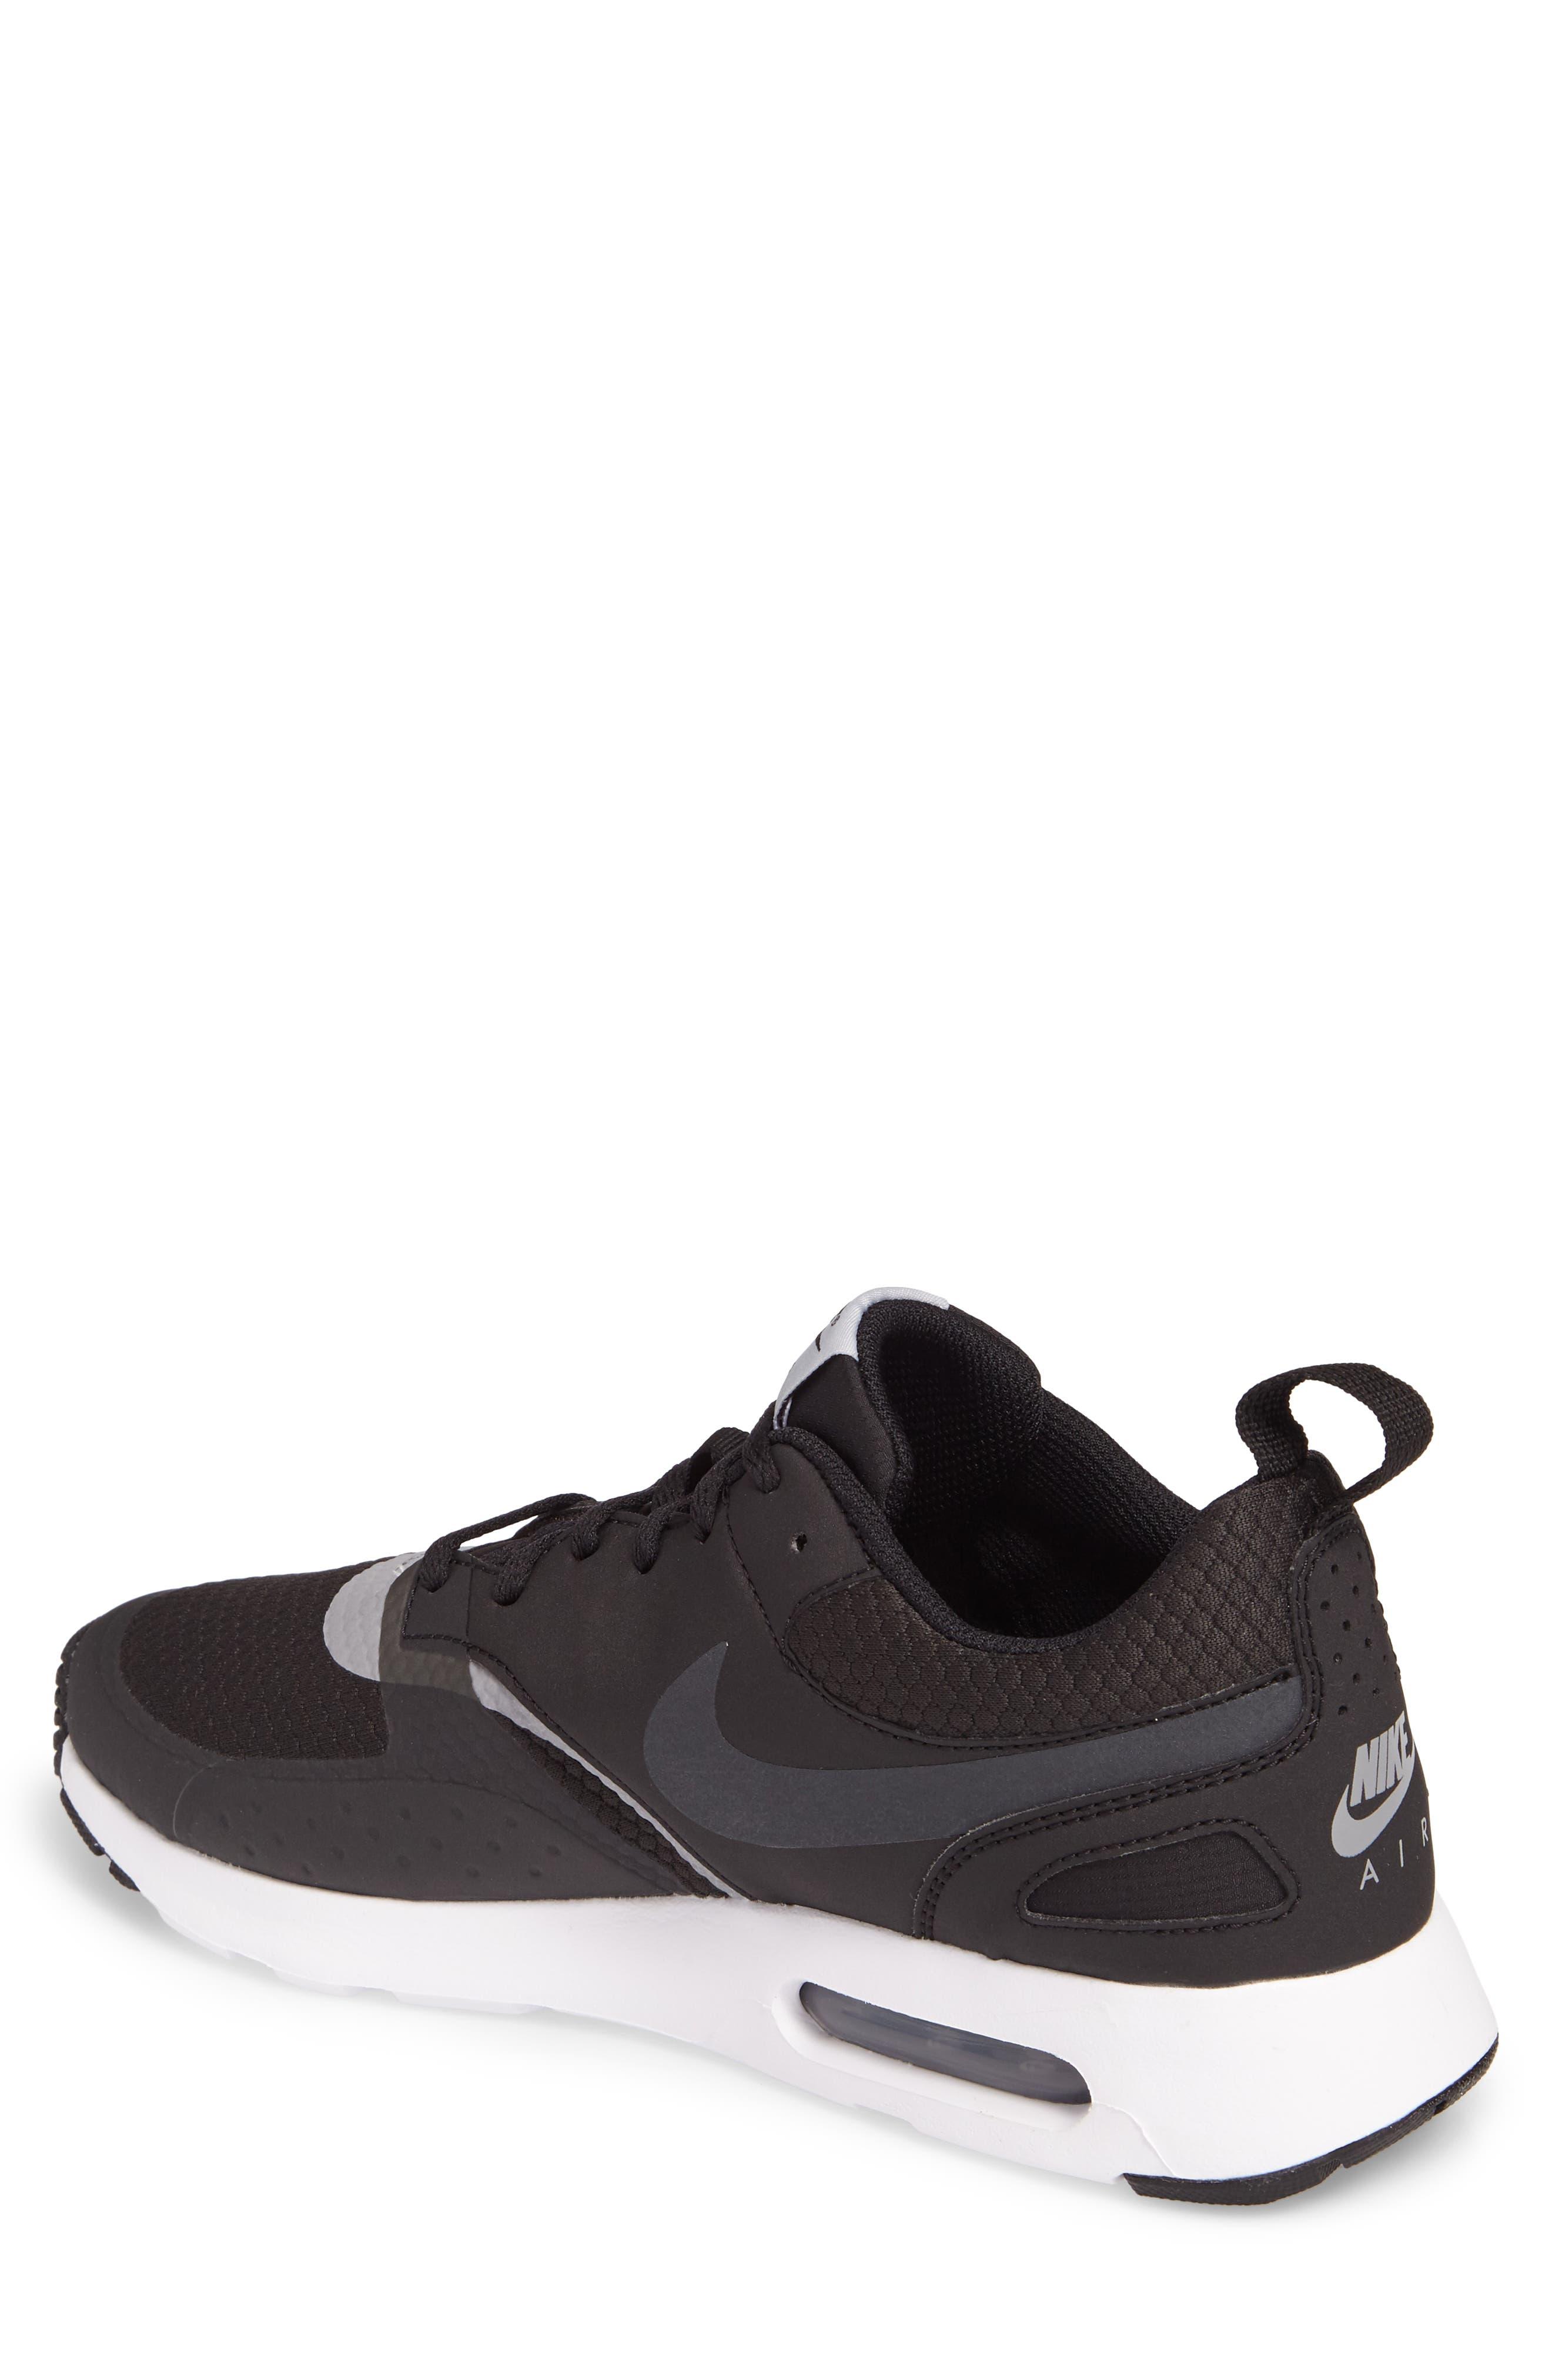 Air Max Vision SE Sneaker,                             Alternate thumbnail 2, color,                             006